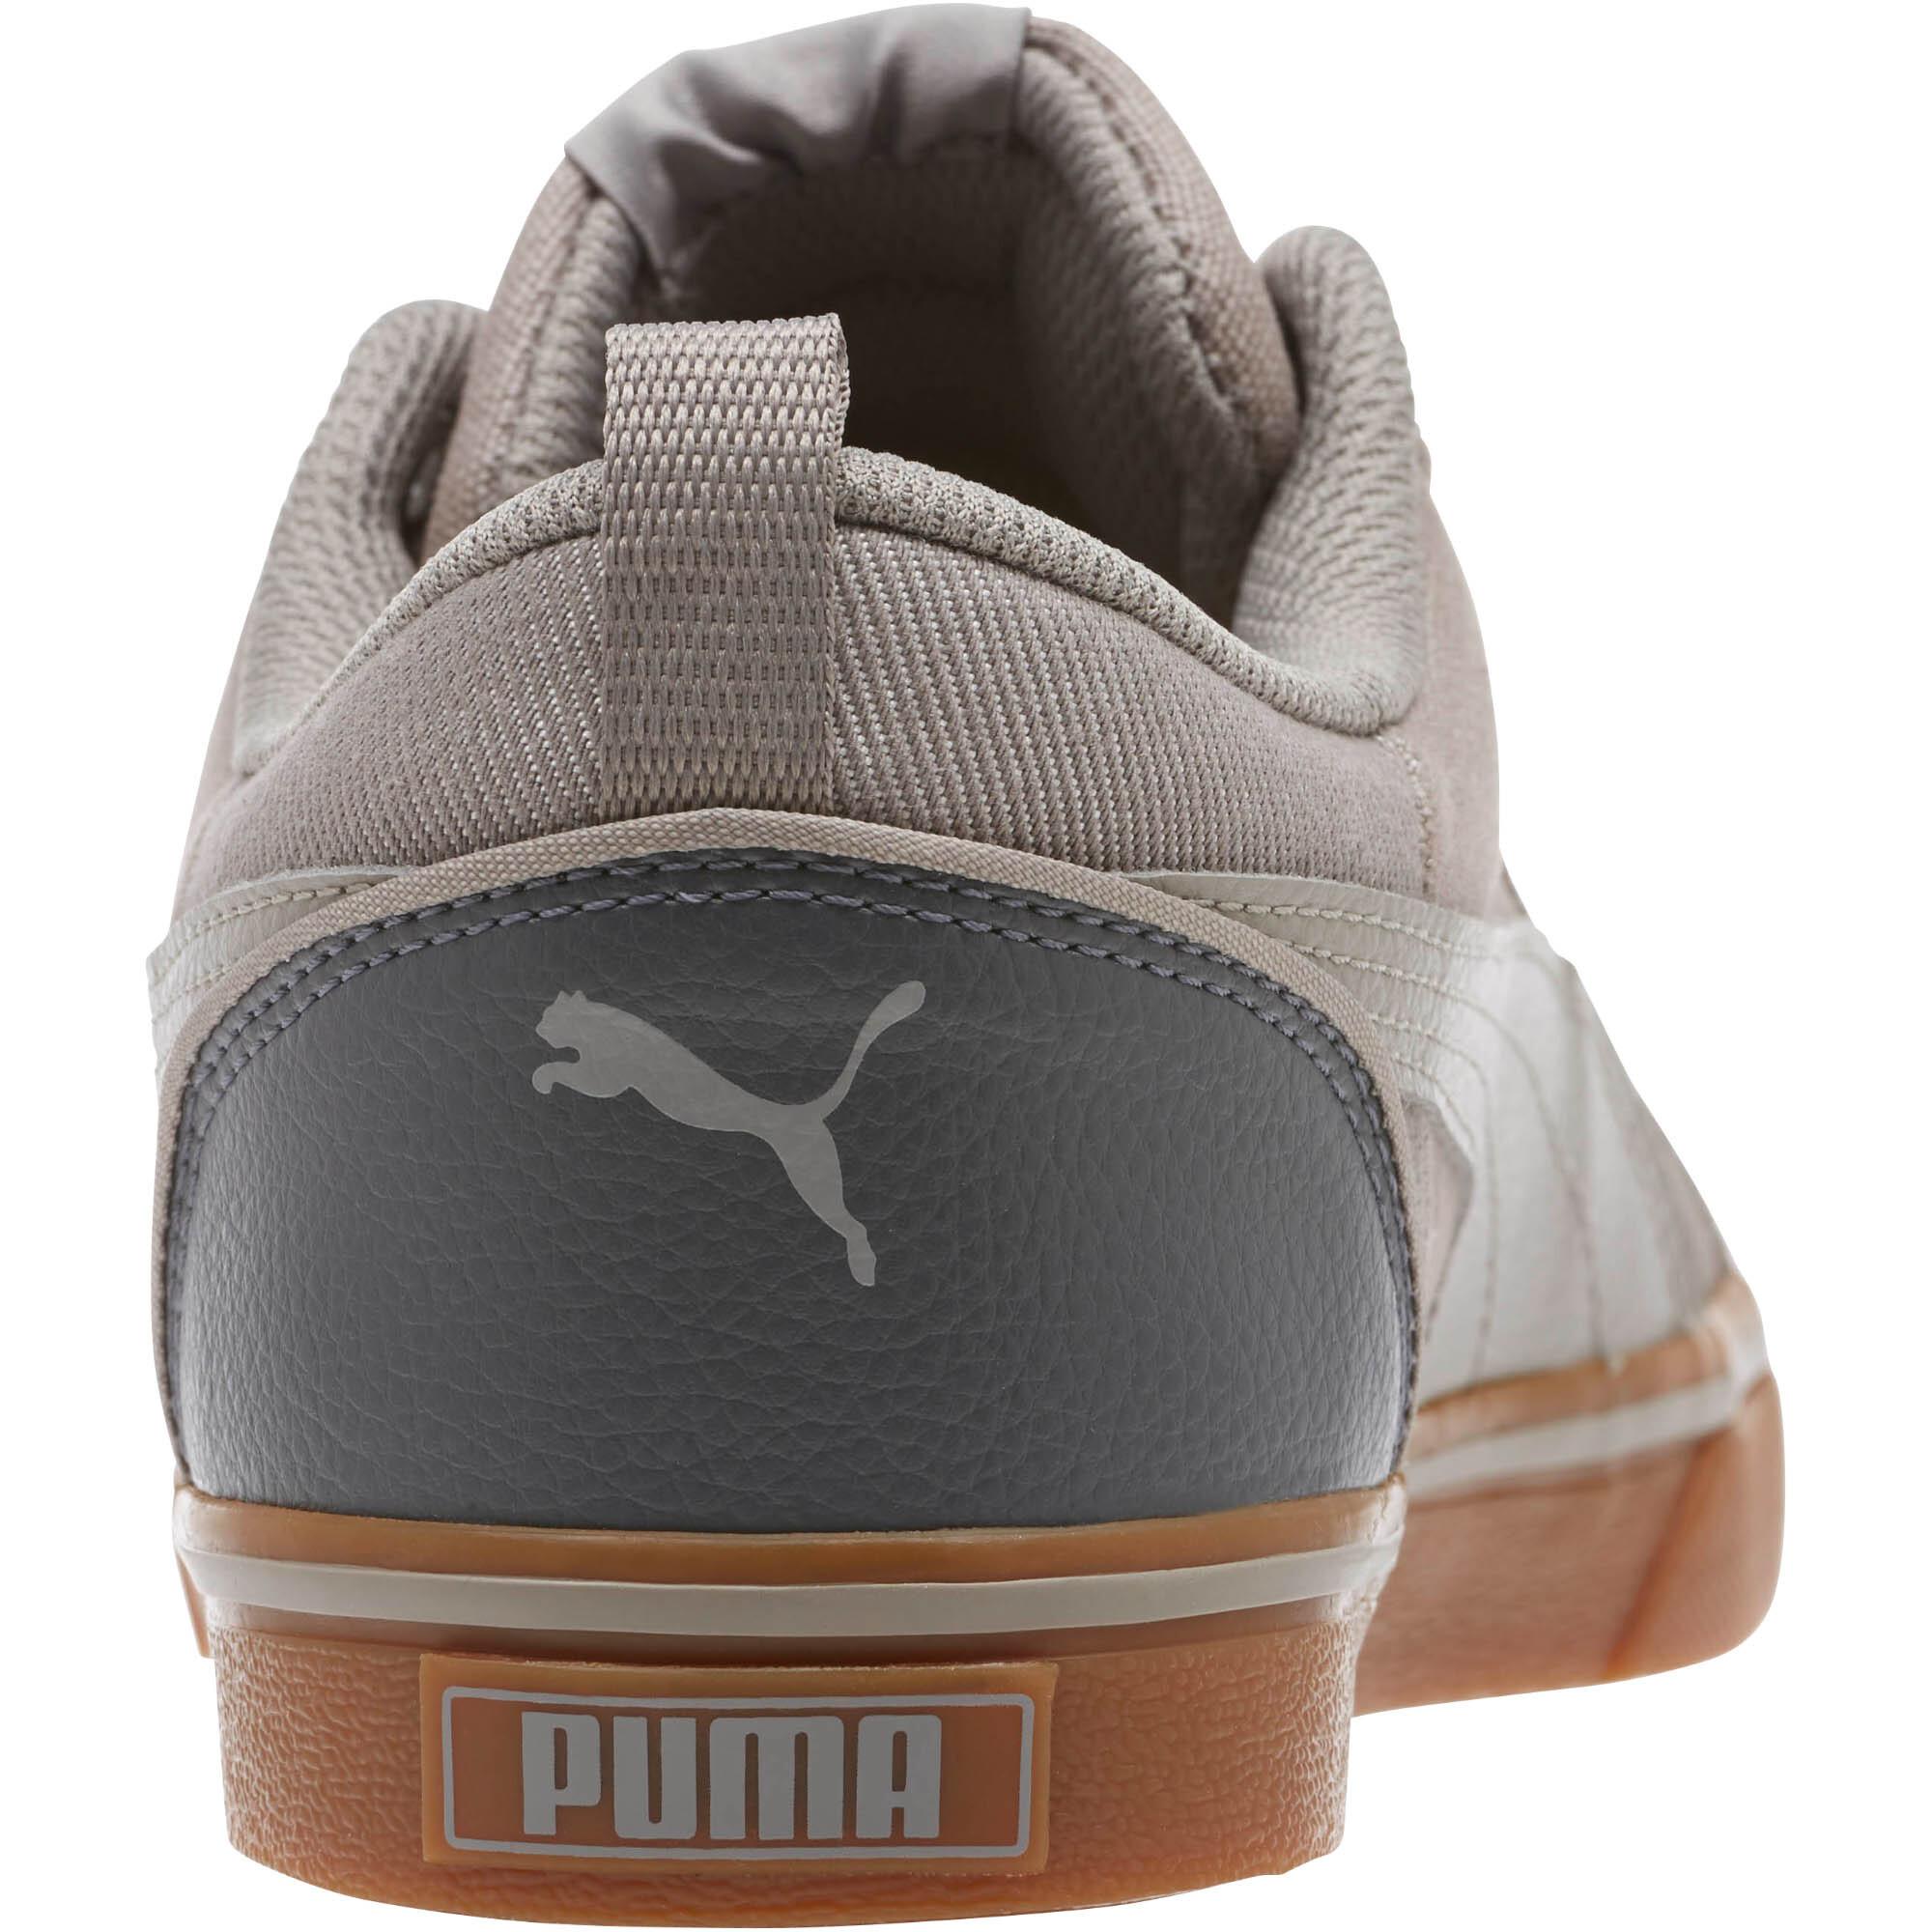 PUMA-PUMA-Bridger-Men-039-s-Sneakers-Men-Shoe-Basics thumbnail 9